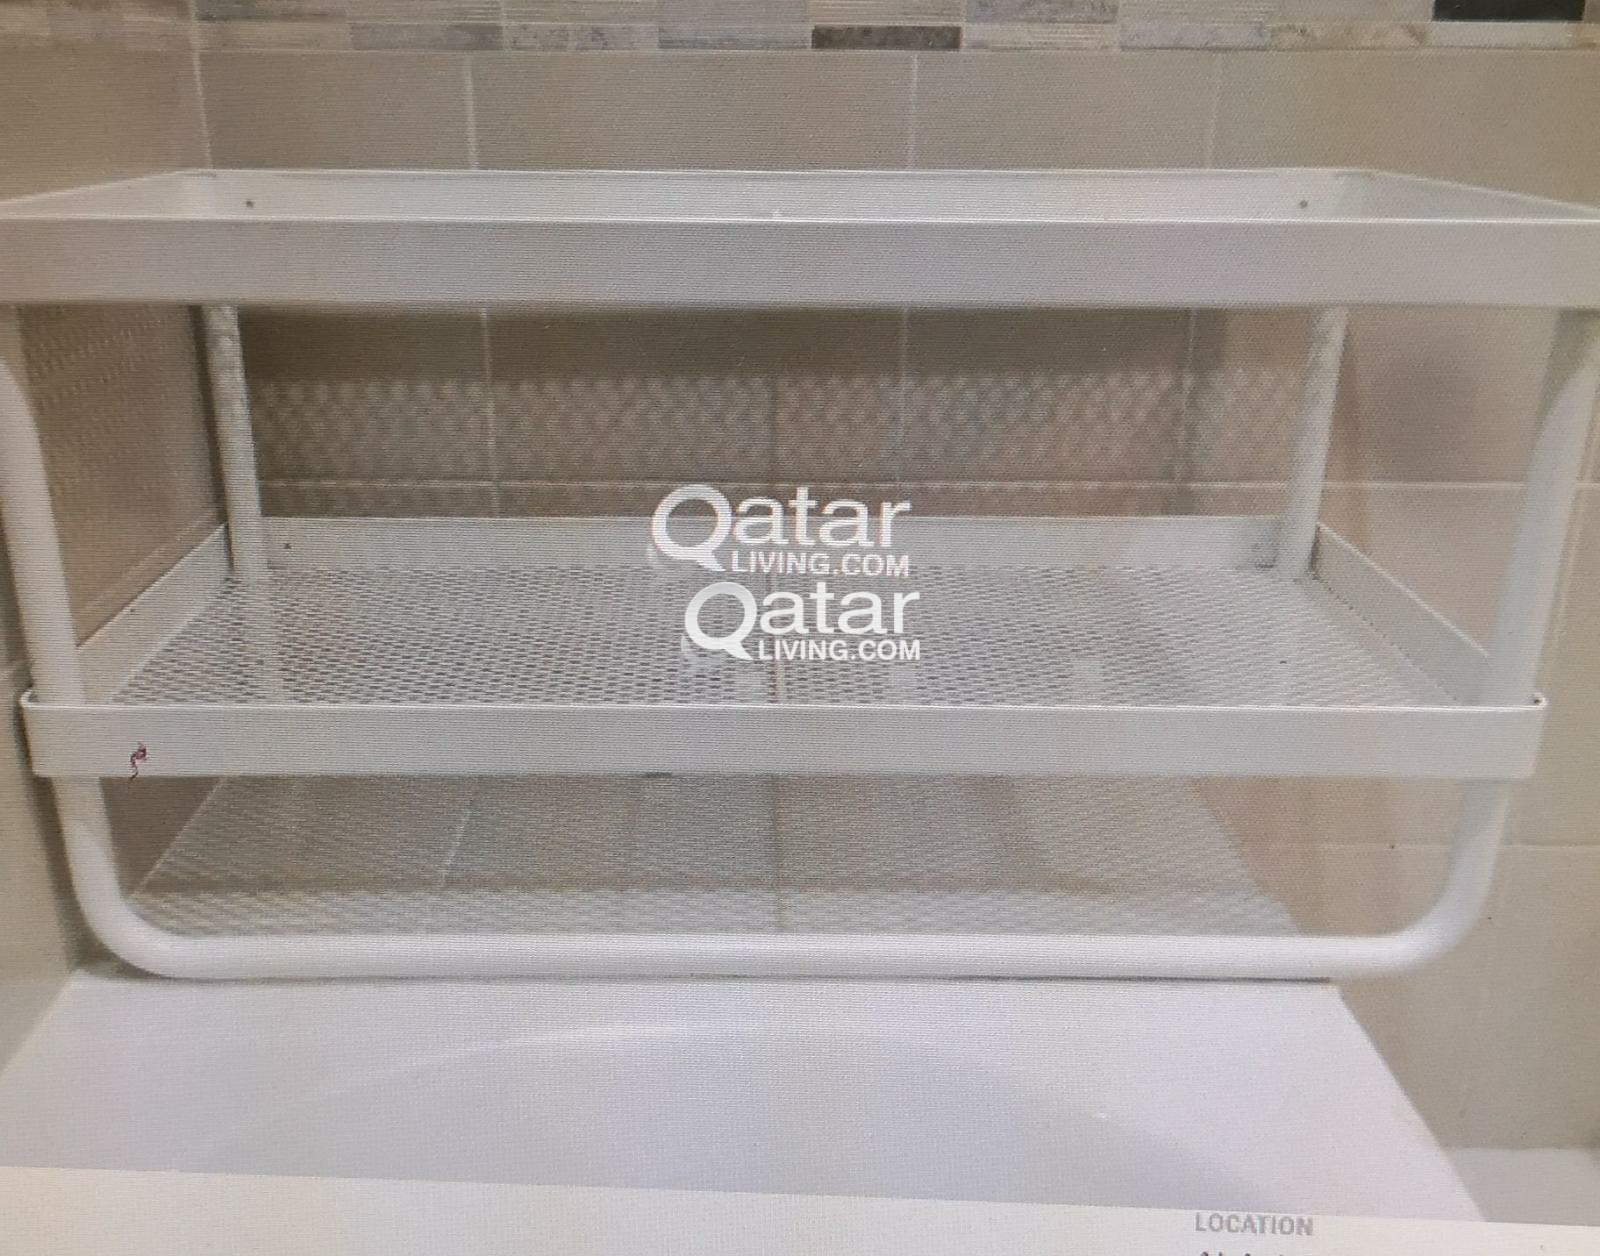 Ikea Bathroom Shelf Wooden Table Foil Dispenser Qatar Living